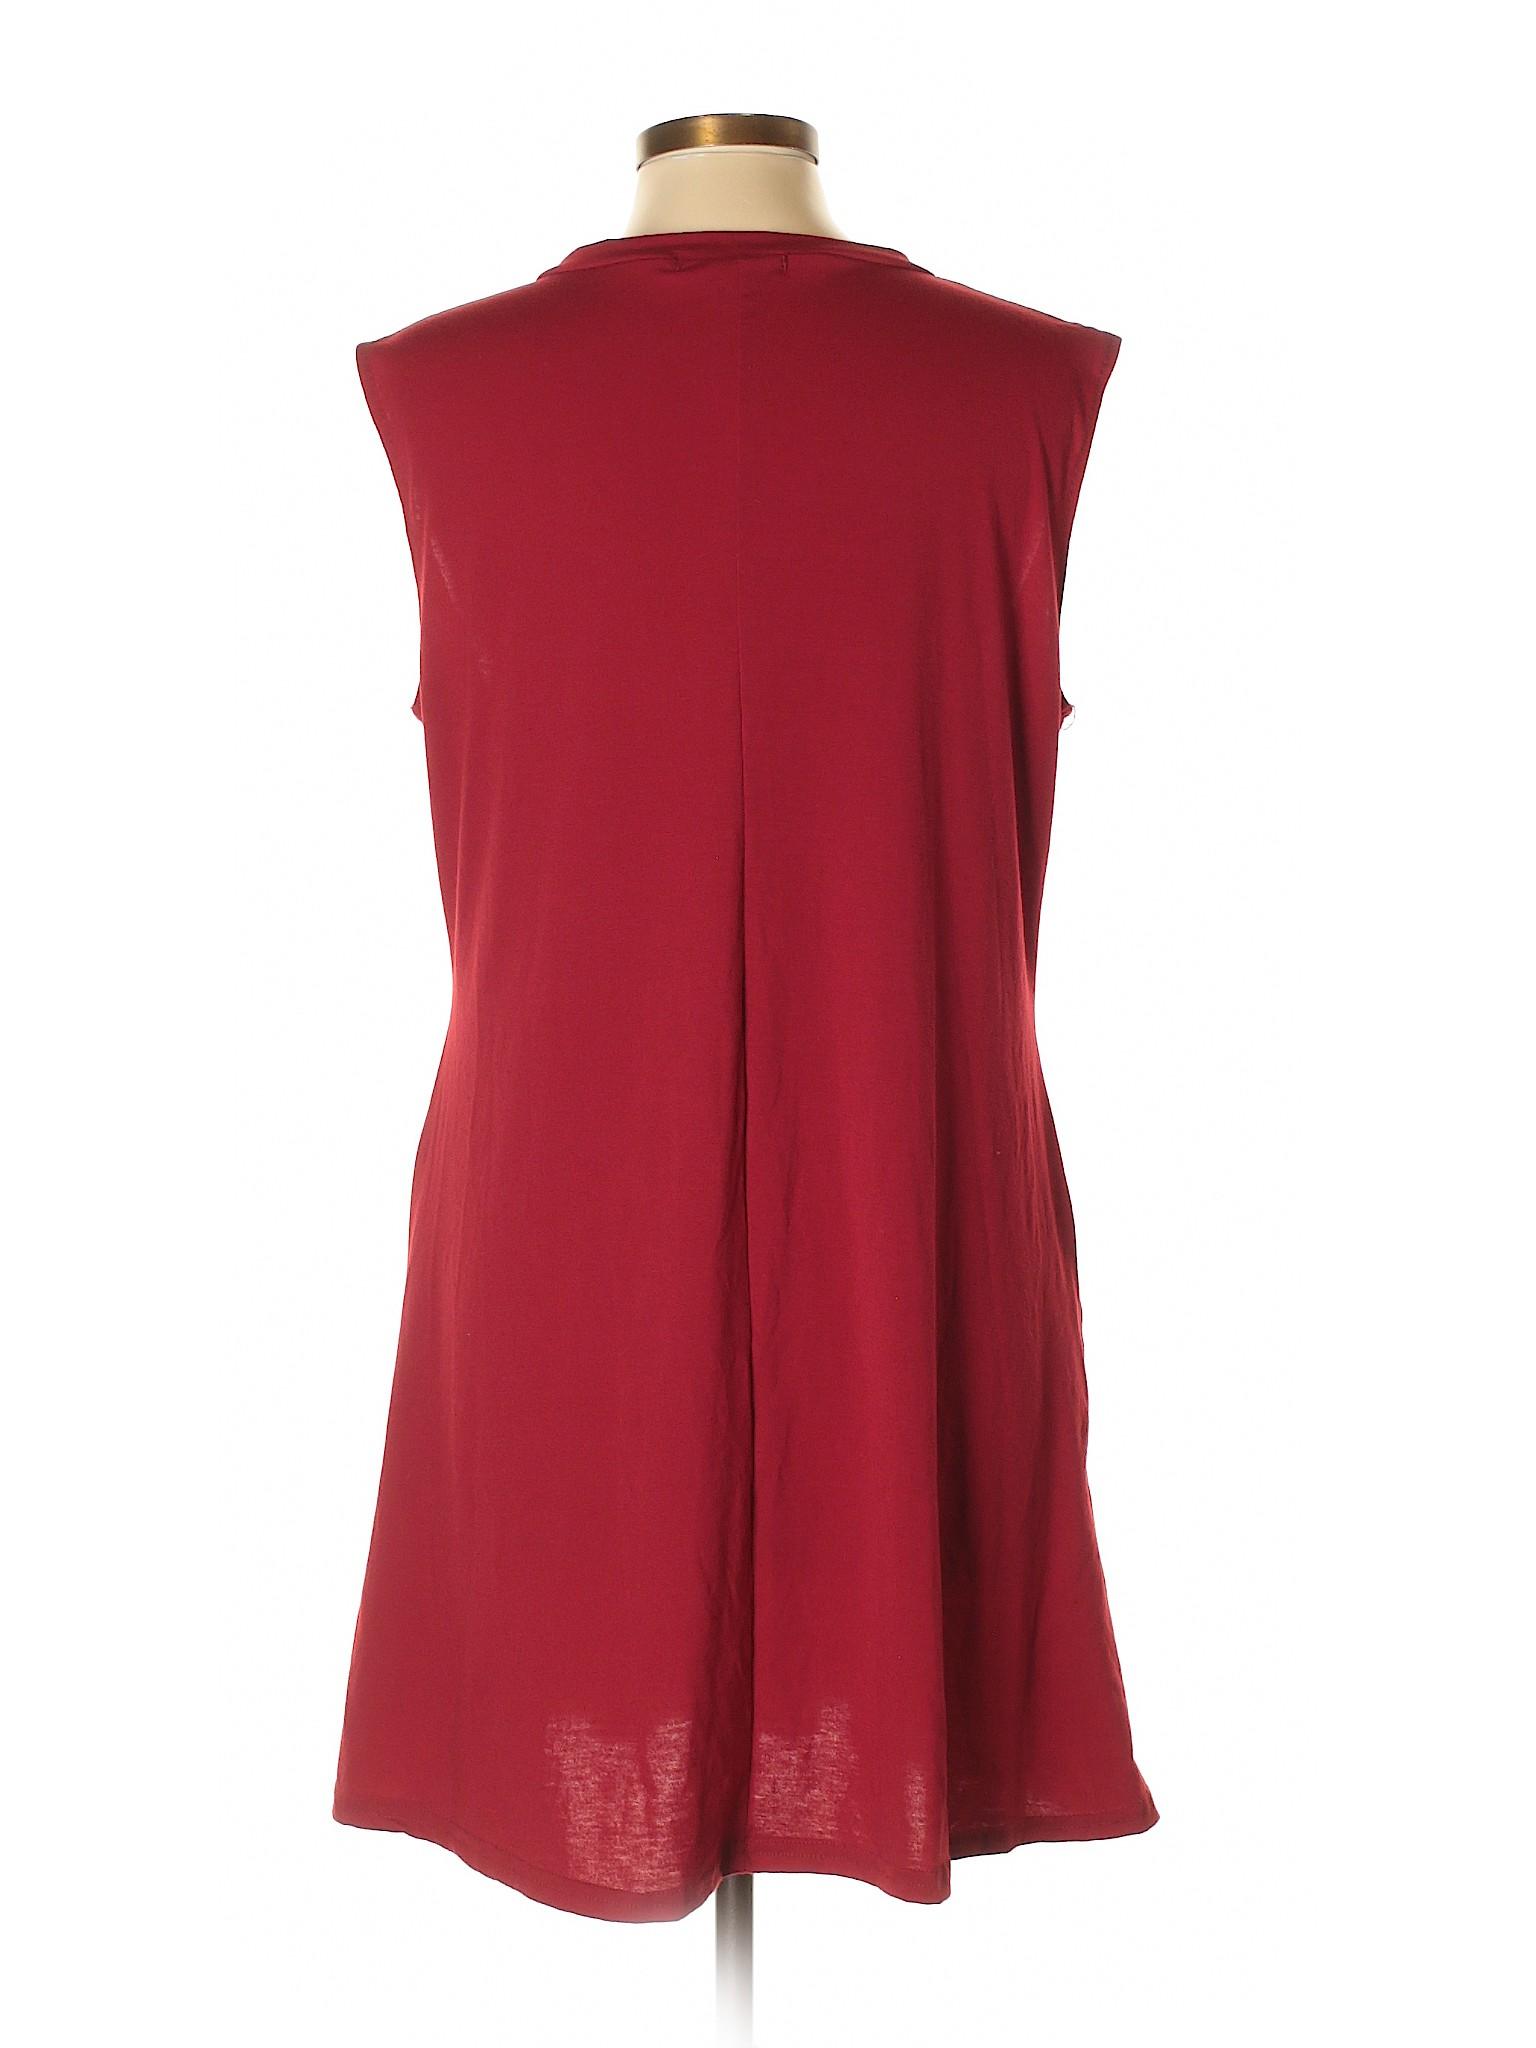 Classics Boutique Dress winter Casual Fashion qW4wS7a8W